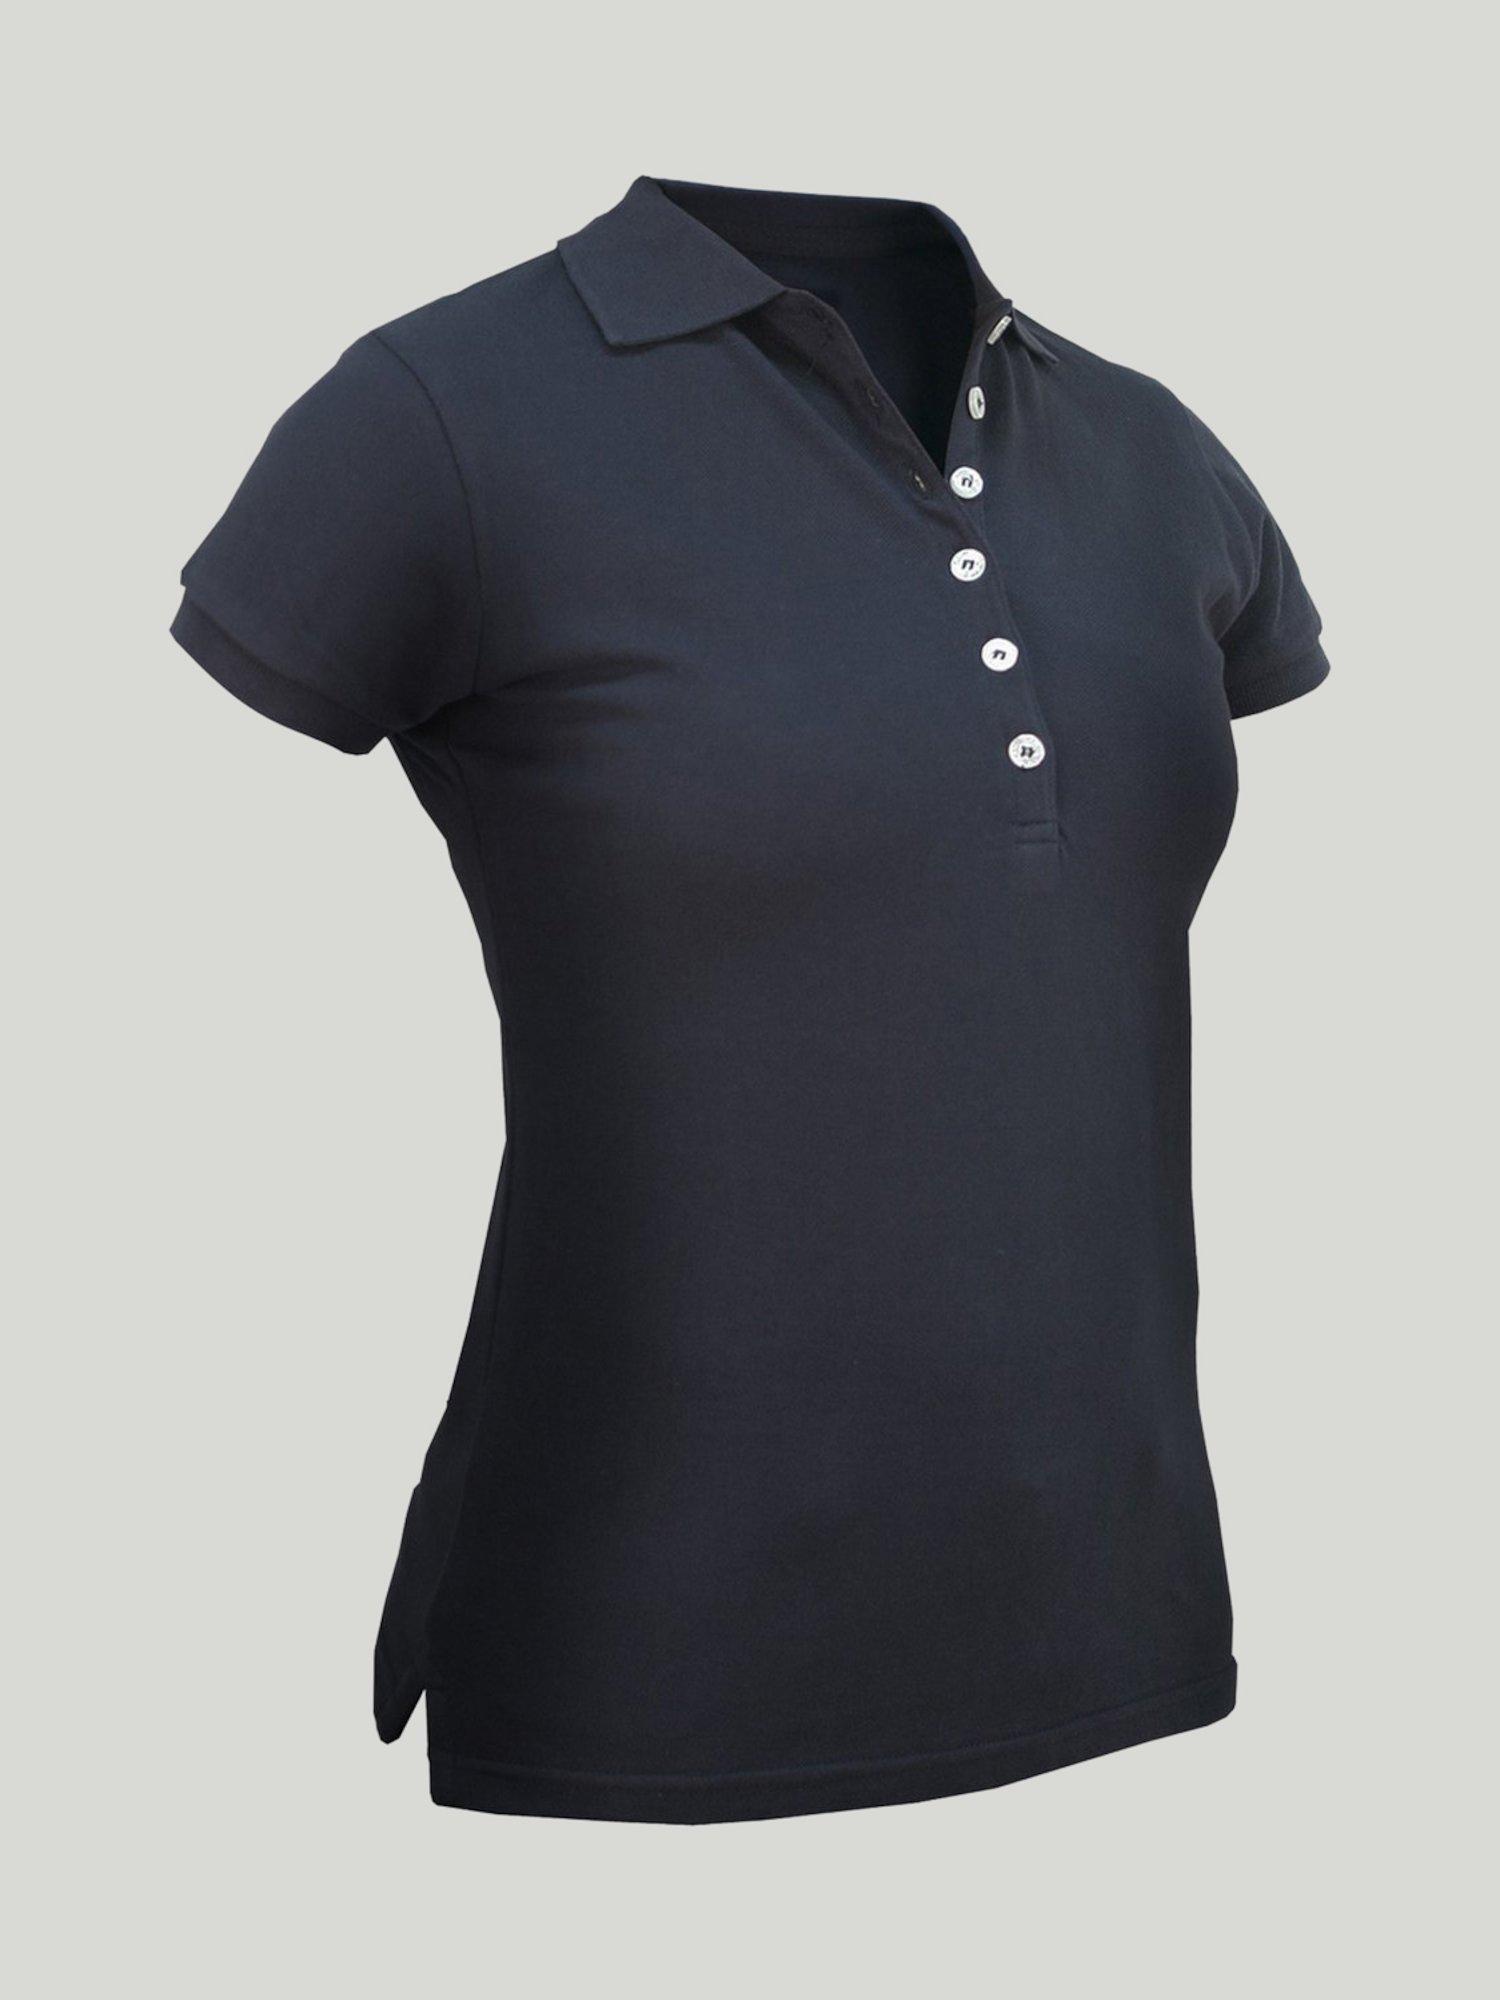 Roseland Ss New polo shirt - Navy